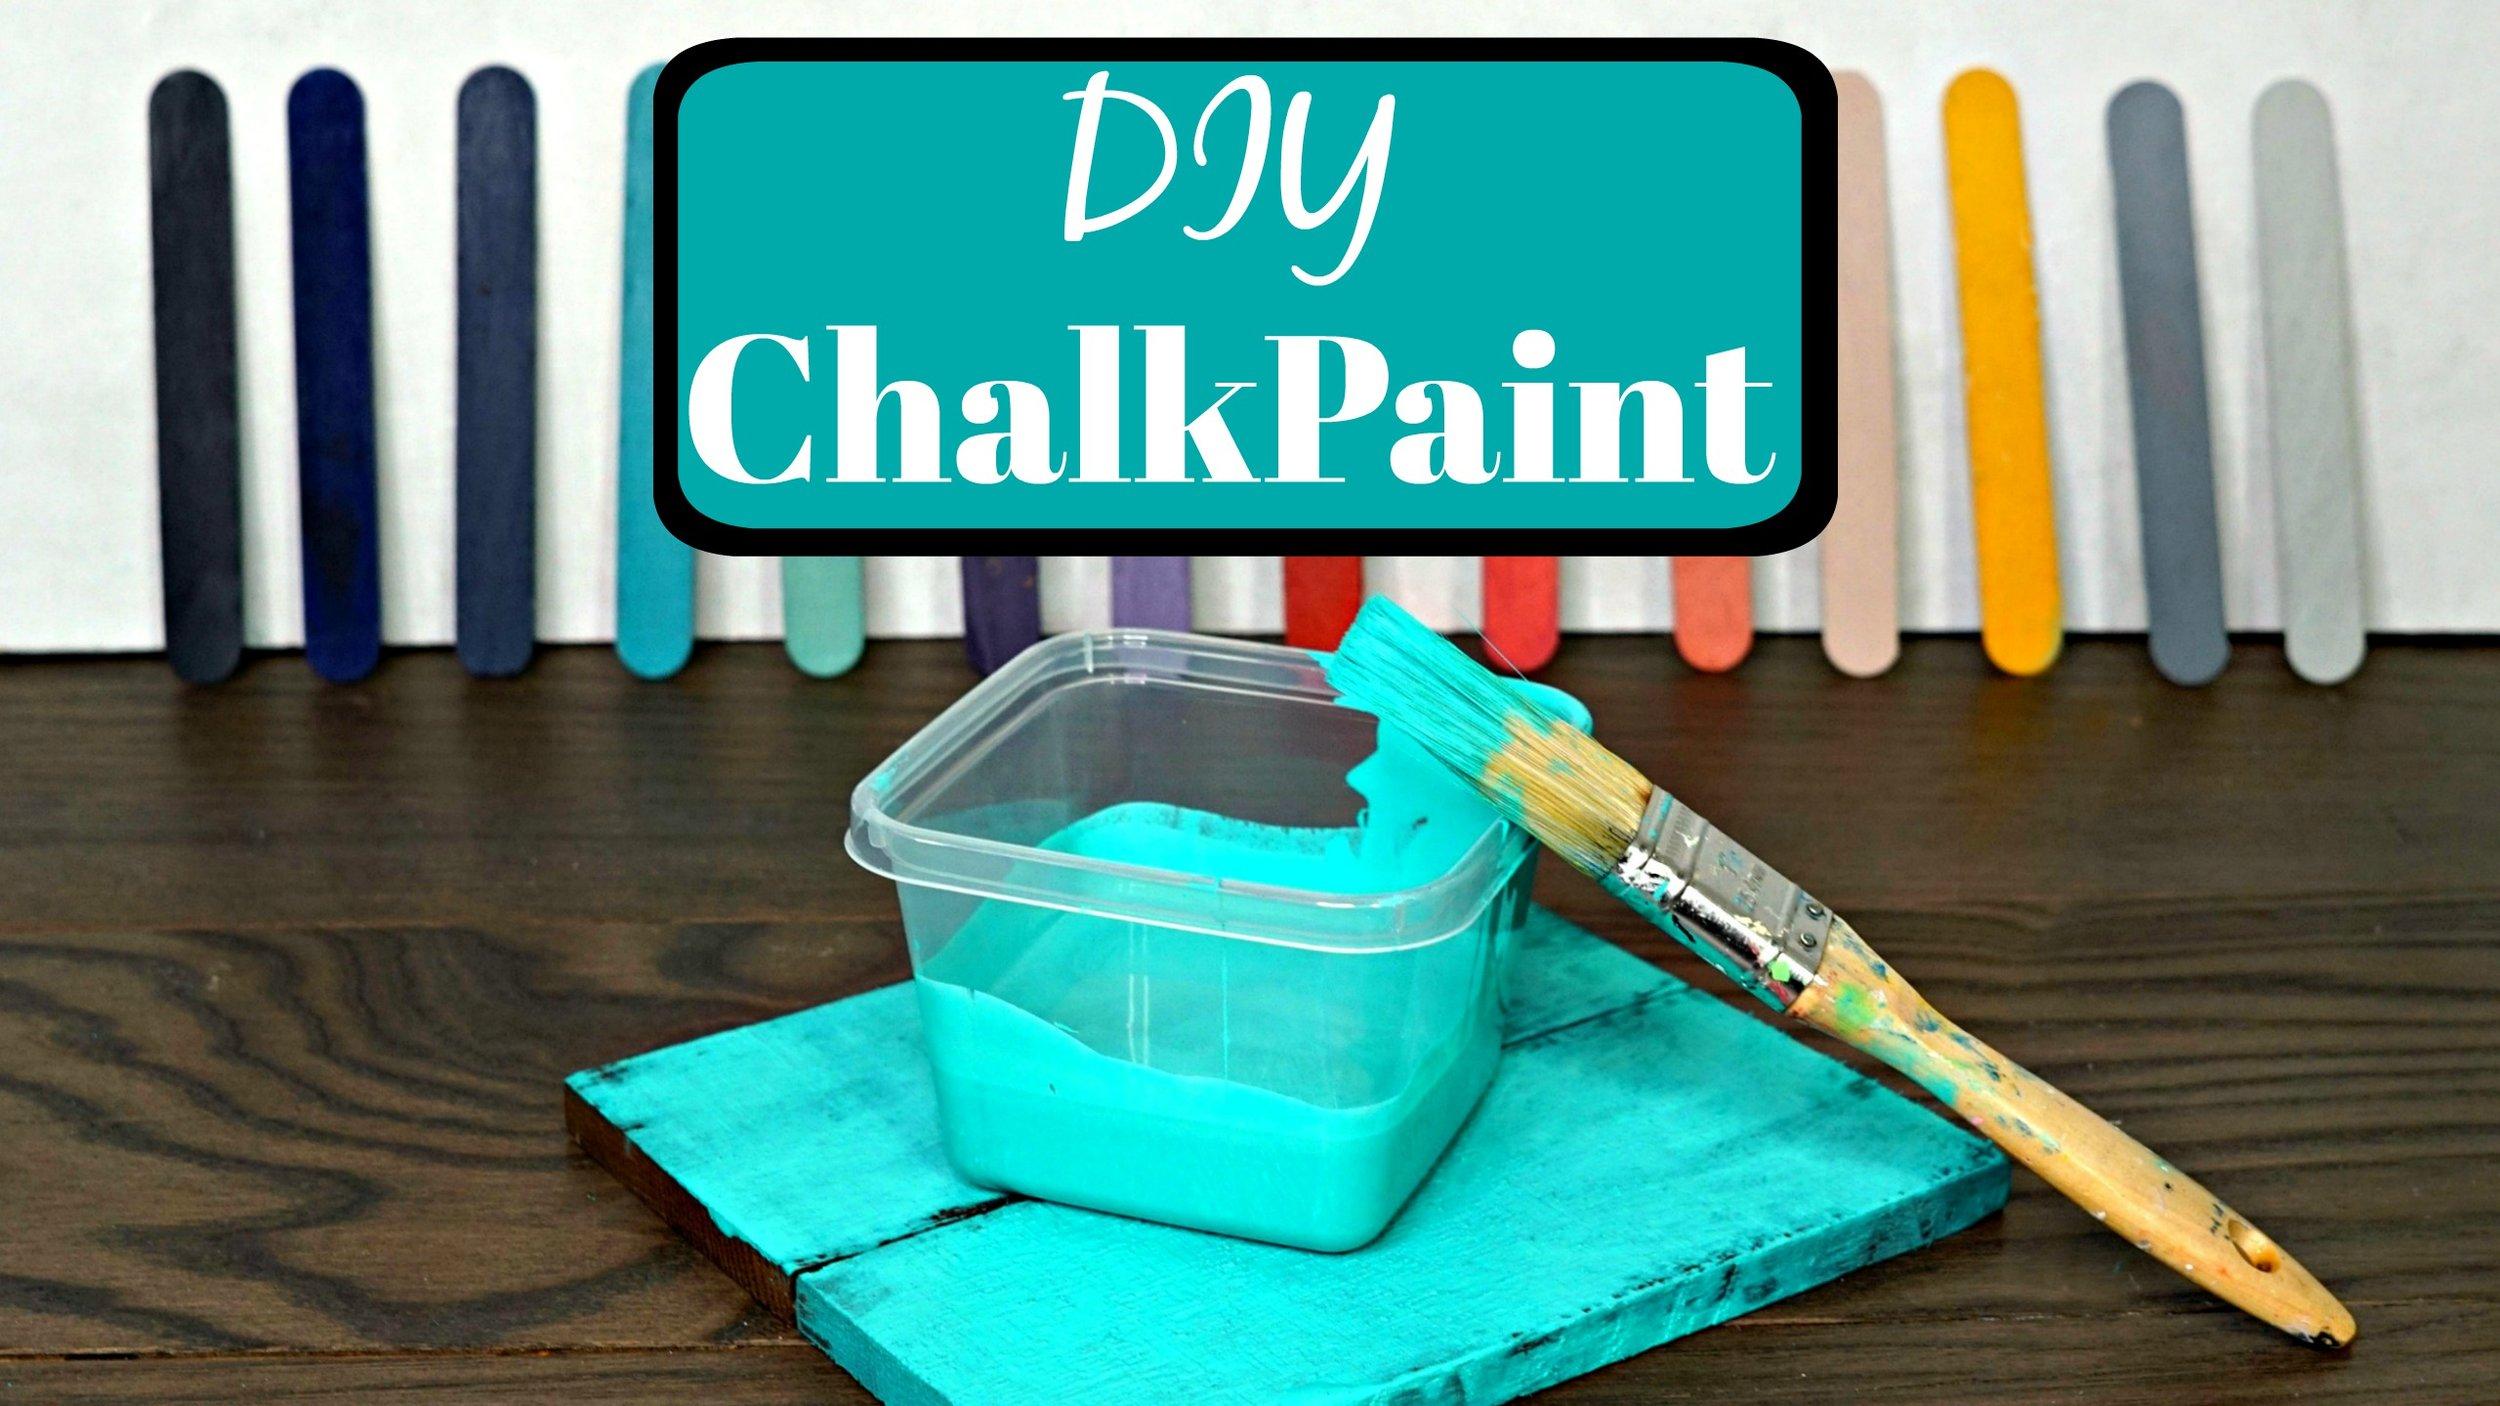 diy chalkpaint Picmonkey final.jpg